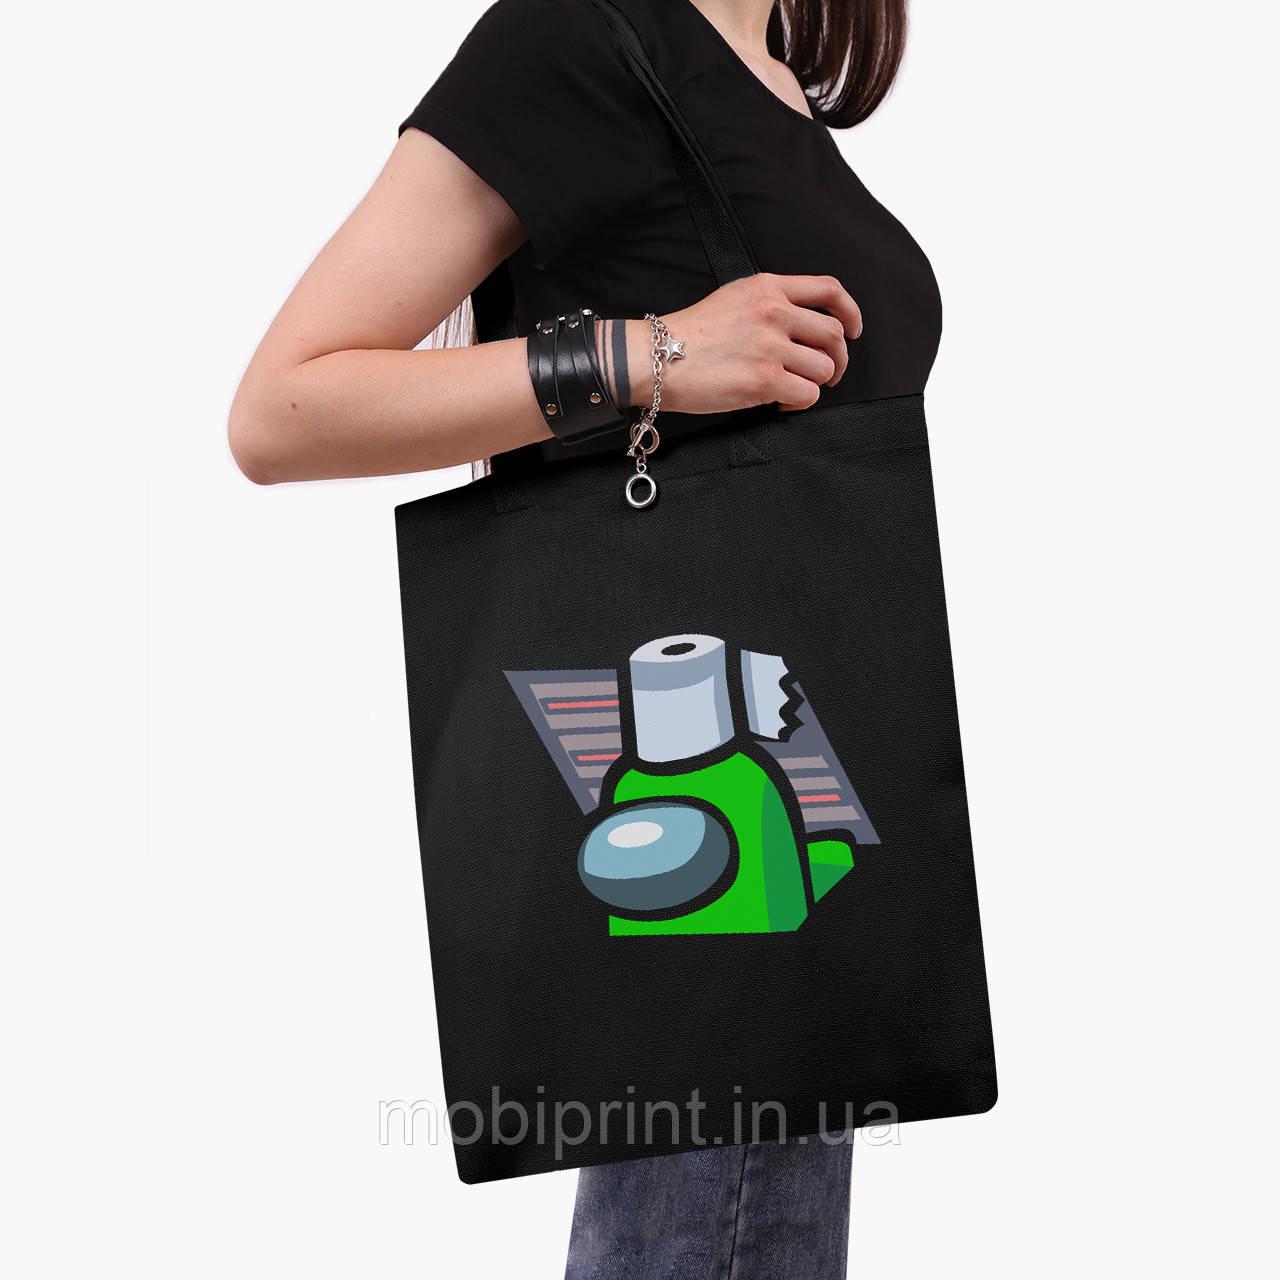 Эко сумка шоппер черная Амонг Ас Зеленый (Among Us Green) (9227-2592-2)  41*35 см